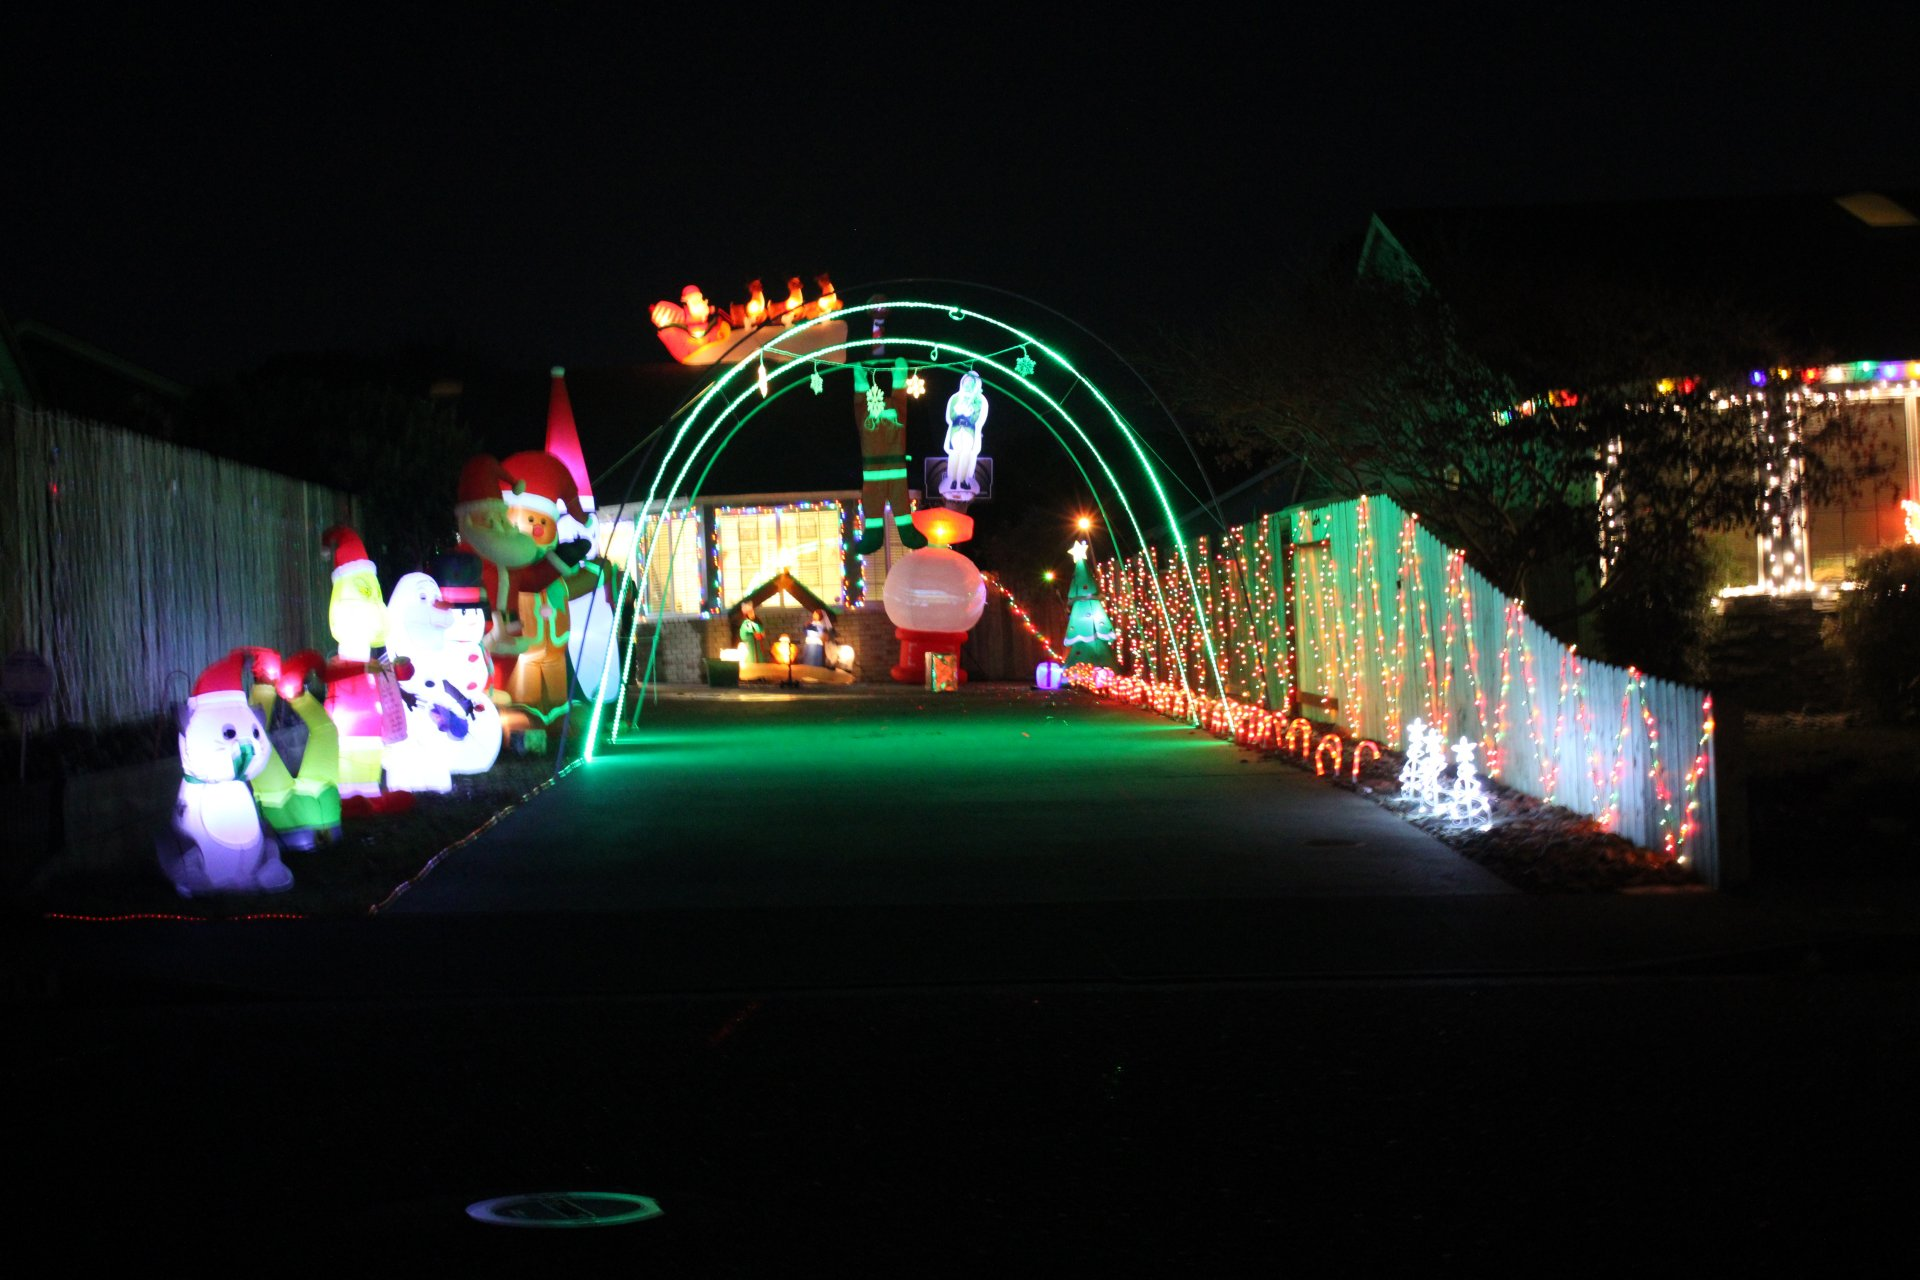 Christmas decor up in McKinleyville neighborhood on Nov. 28 | Photo by Becca Laurenson